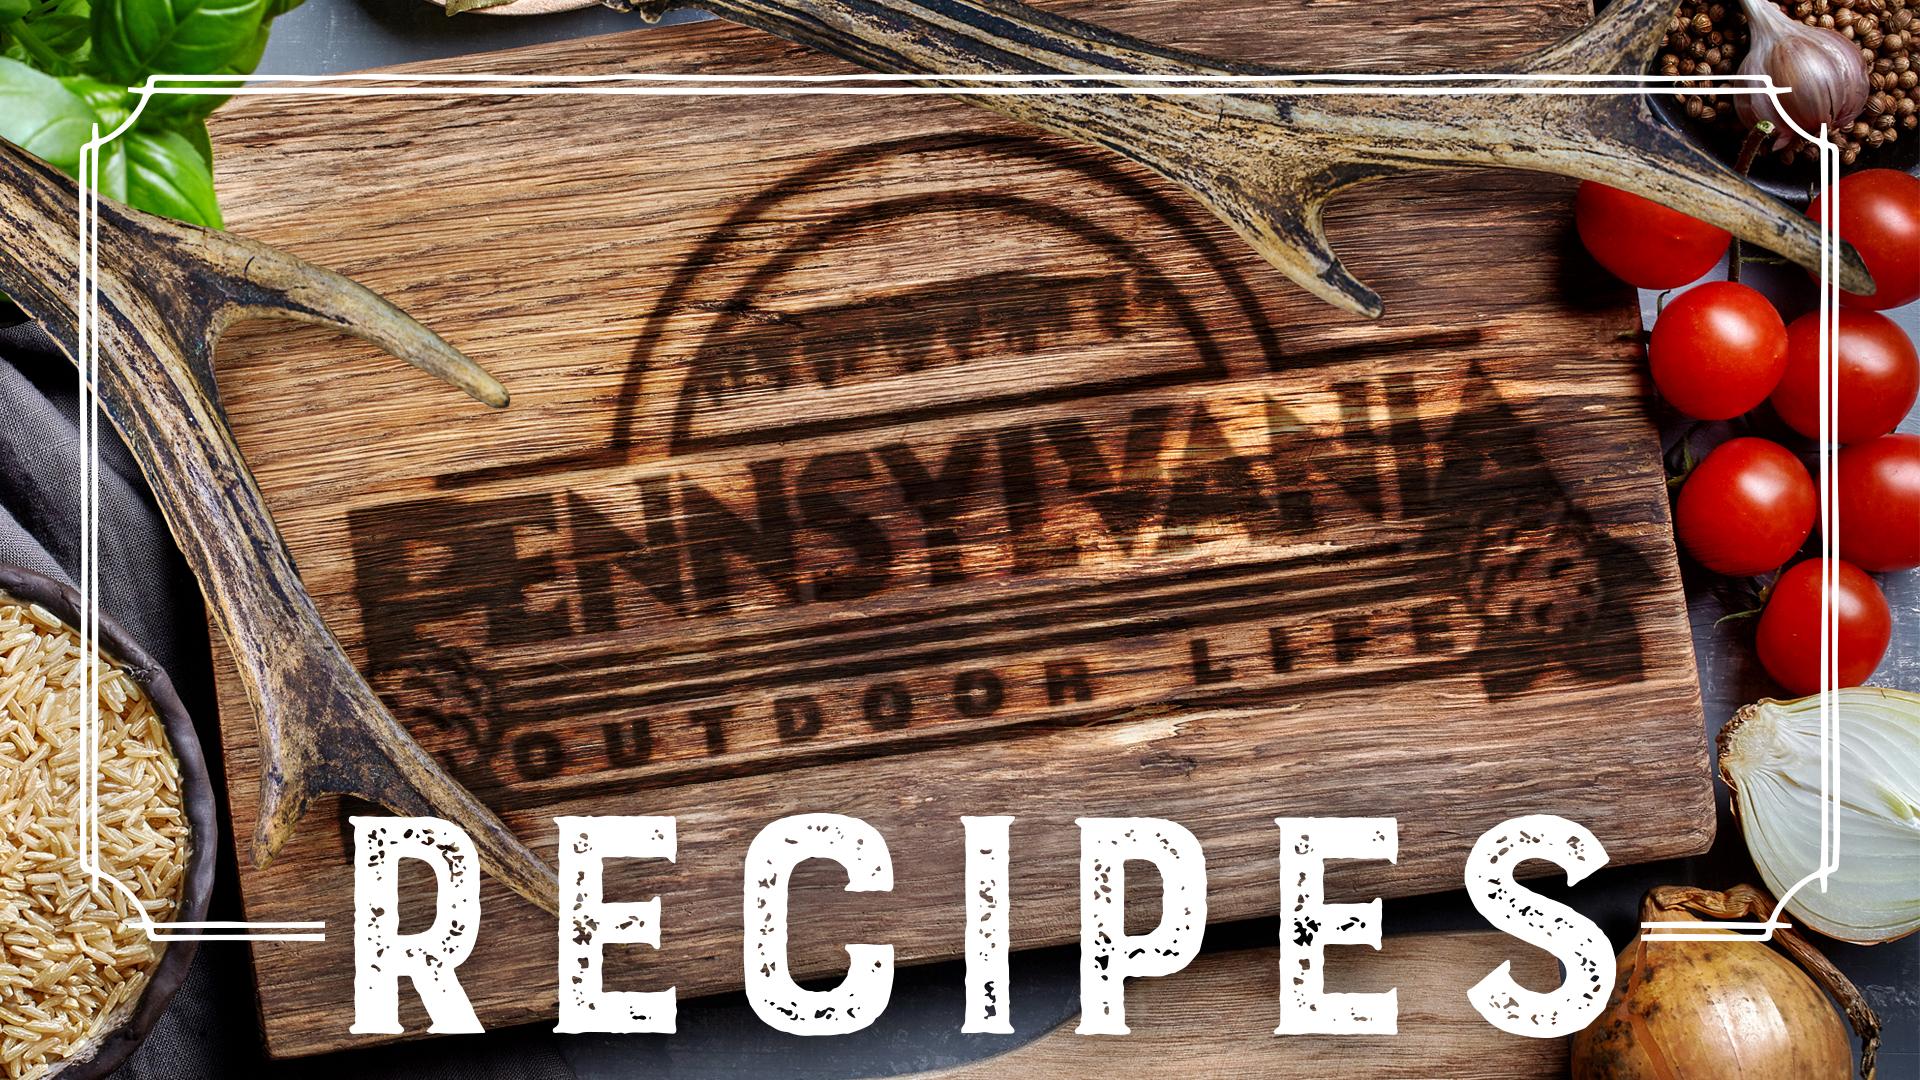 PA Outdoor Life Recipes